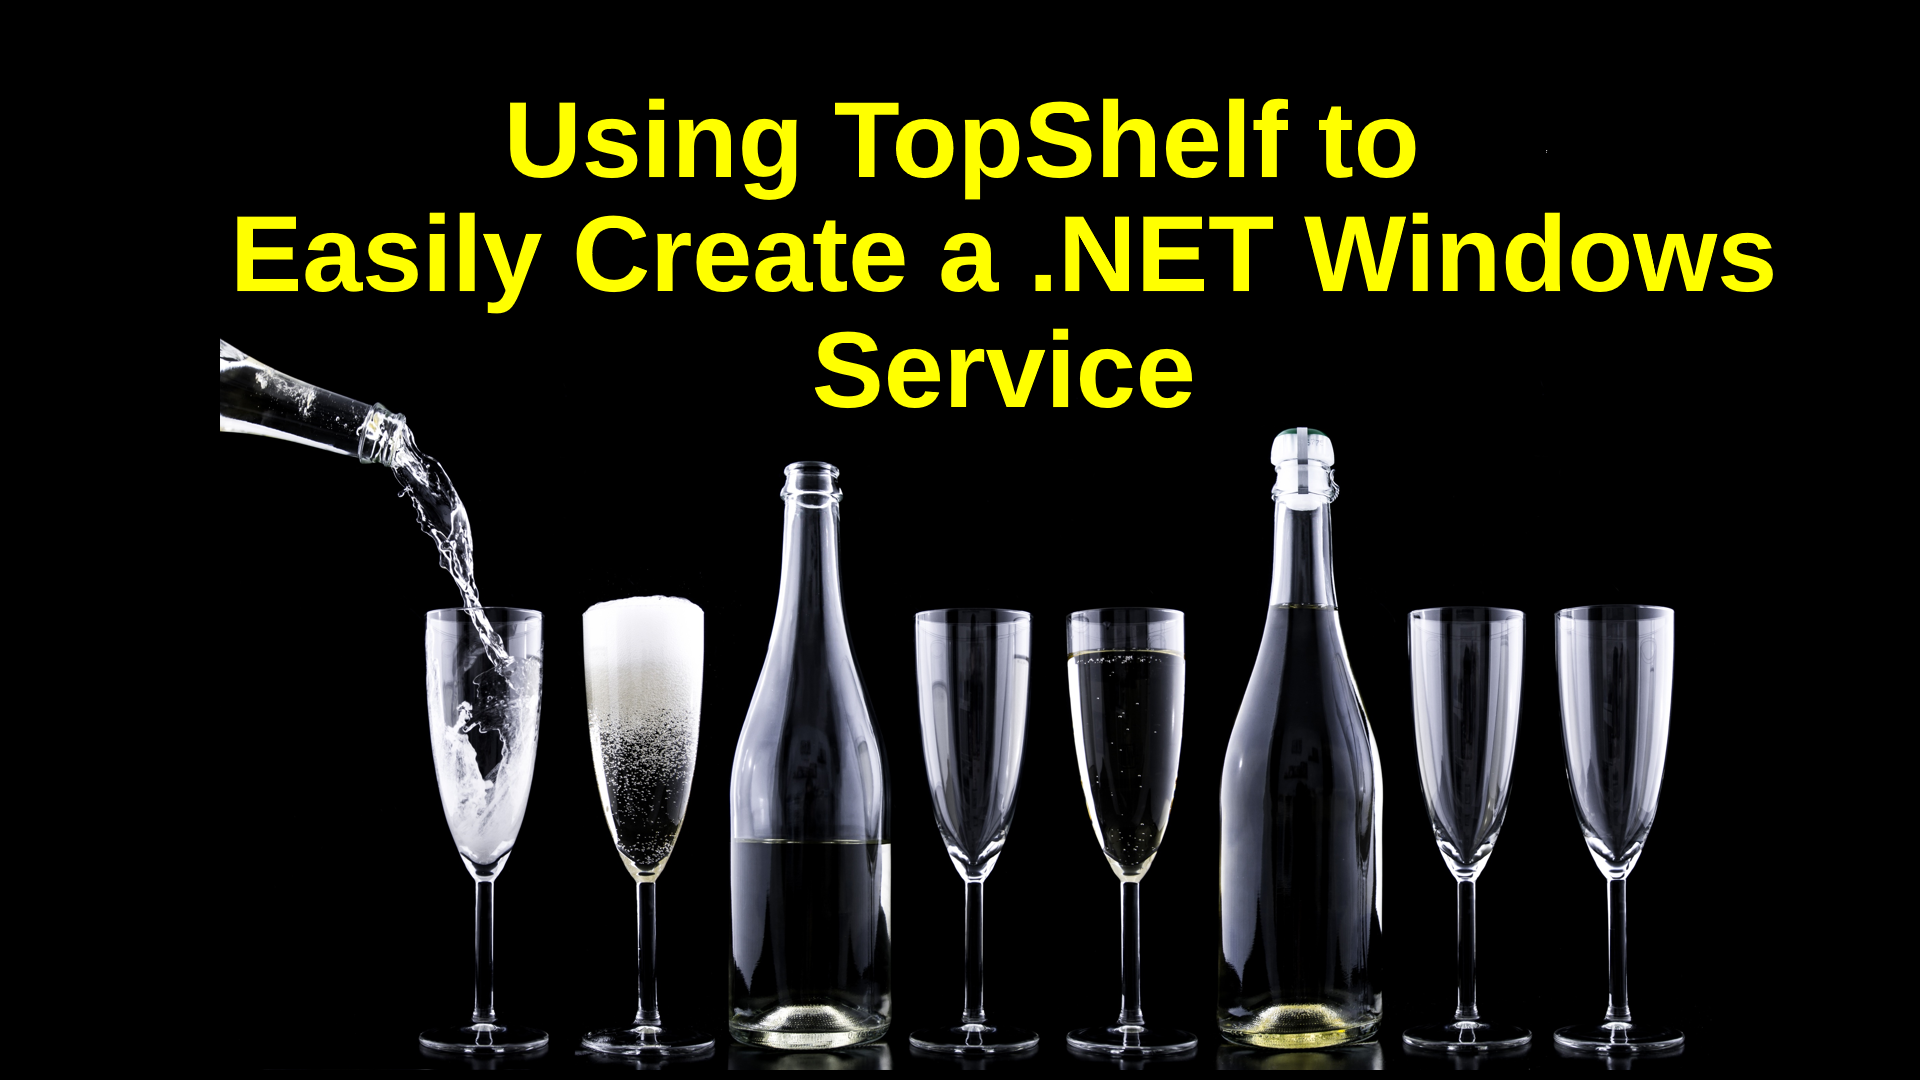 Using TopShelf to Easily Create a  NET Windows Service